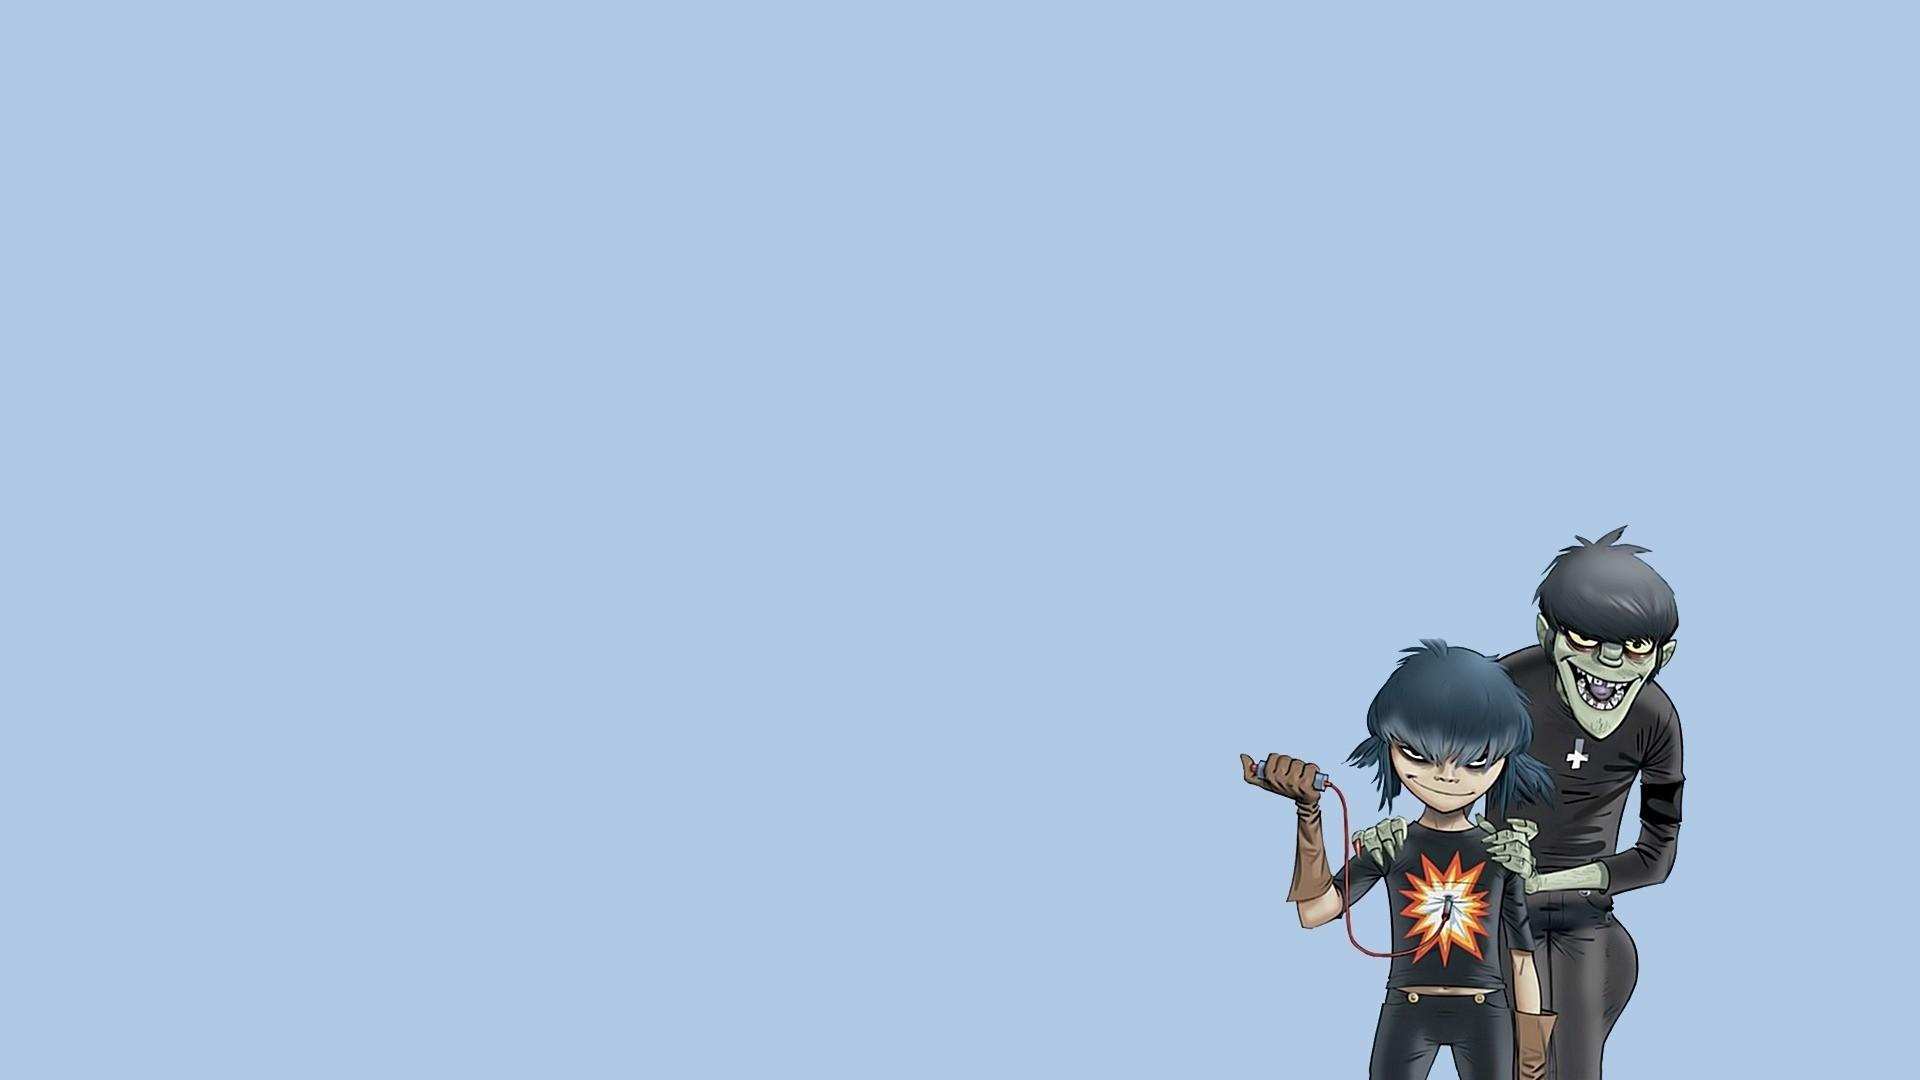 Minimalistic Gorillaz Noodles 2D : Desktop and mobile wallpaper .